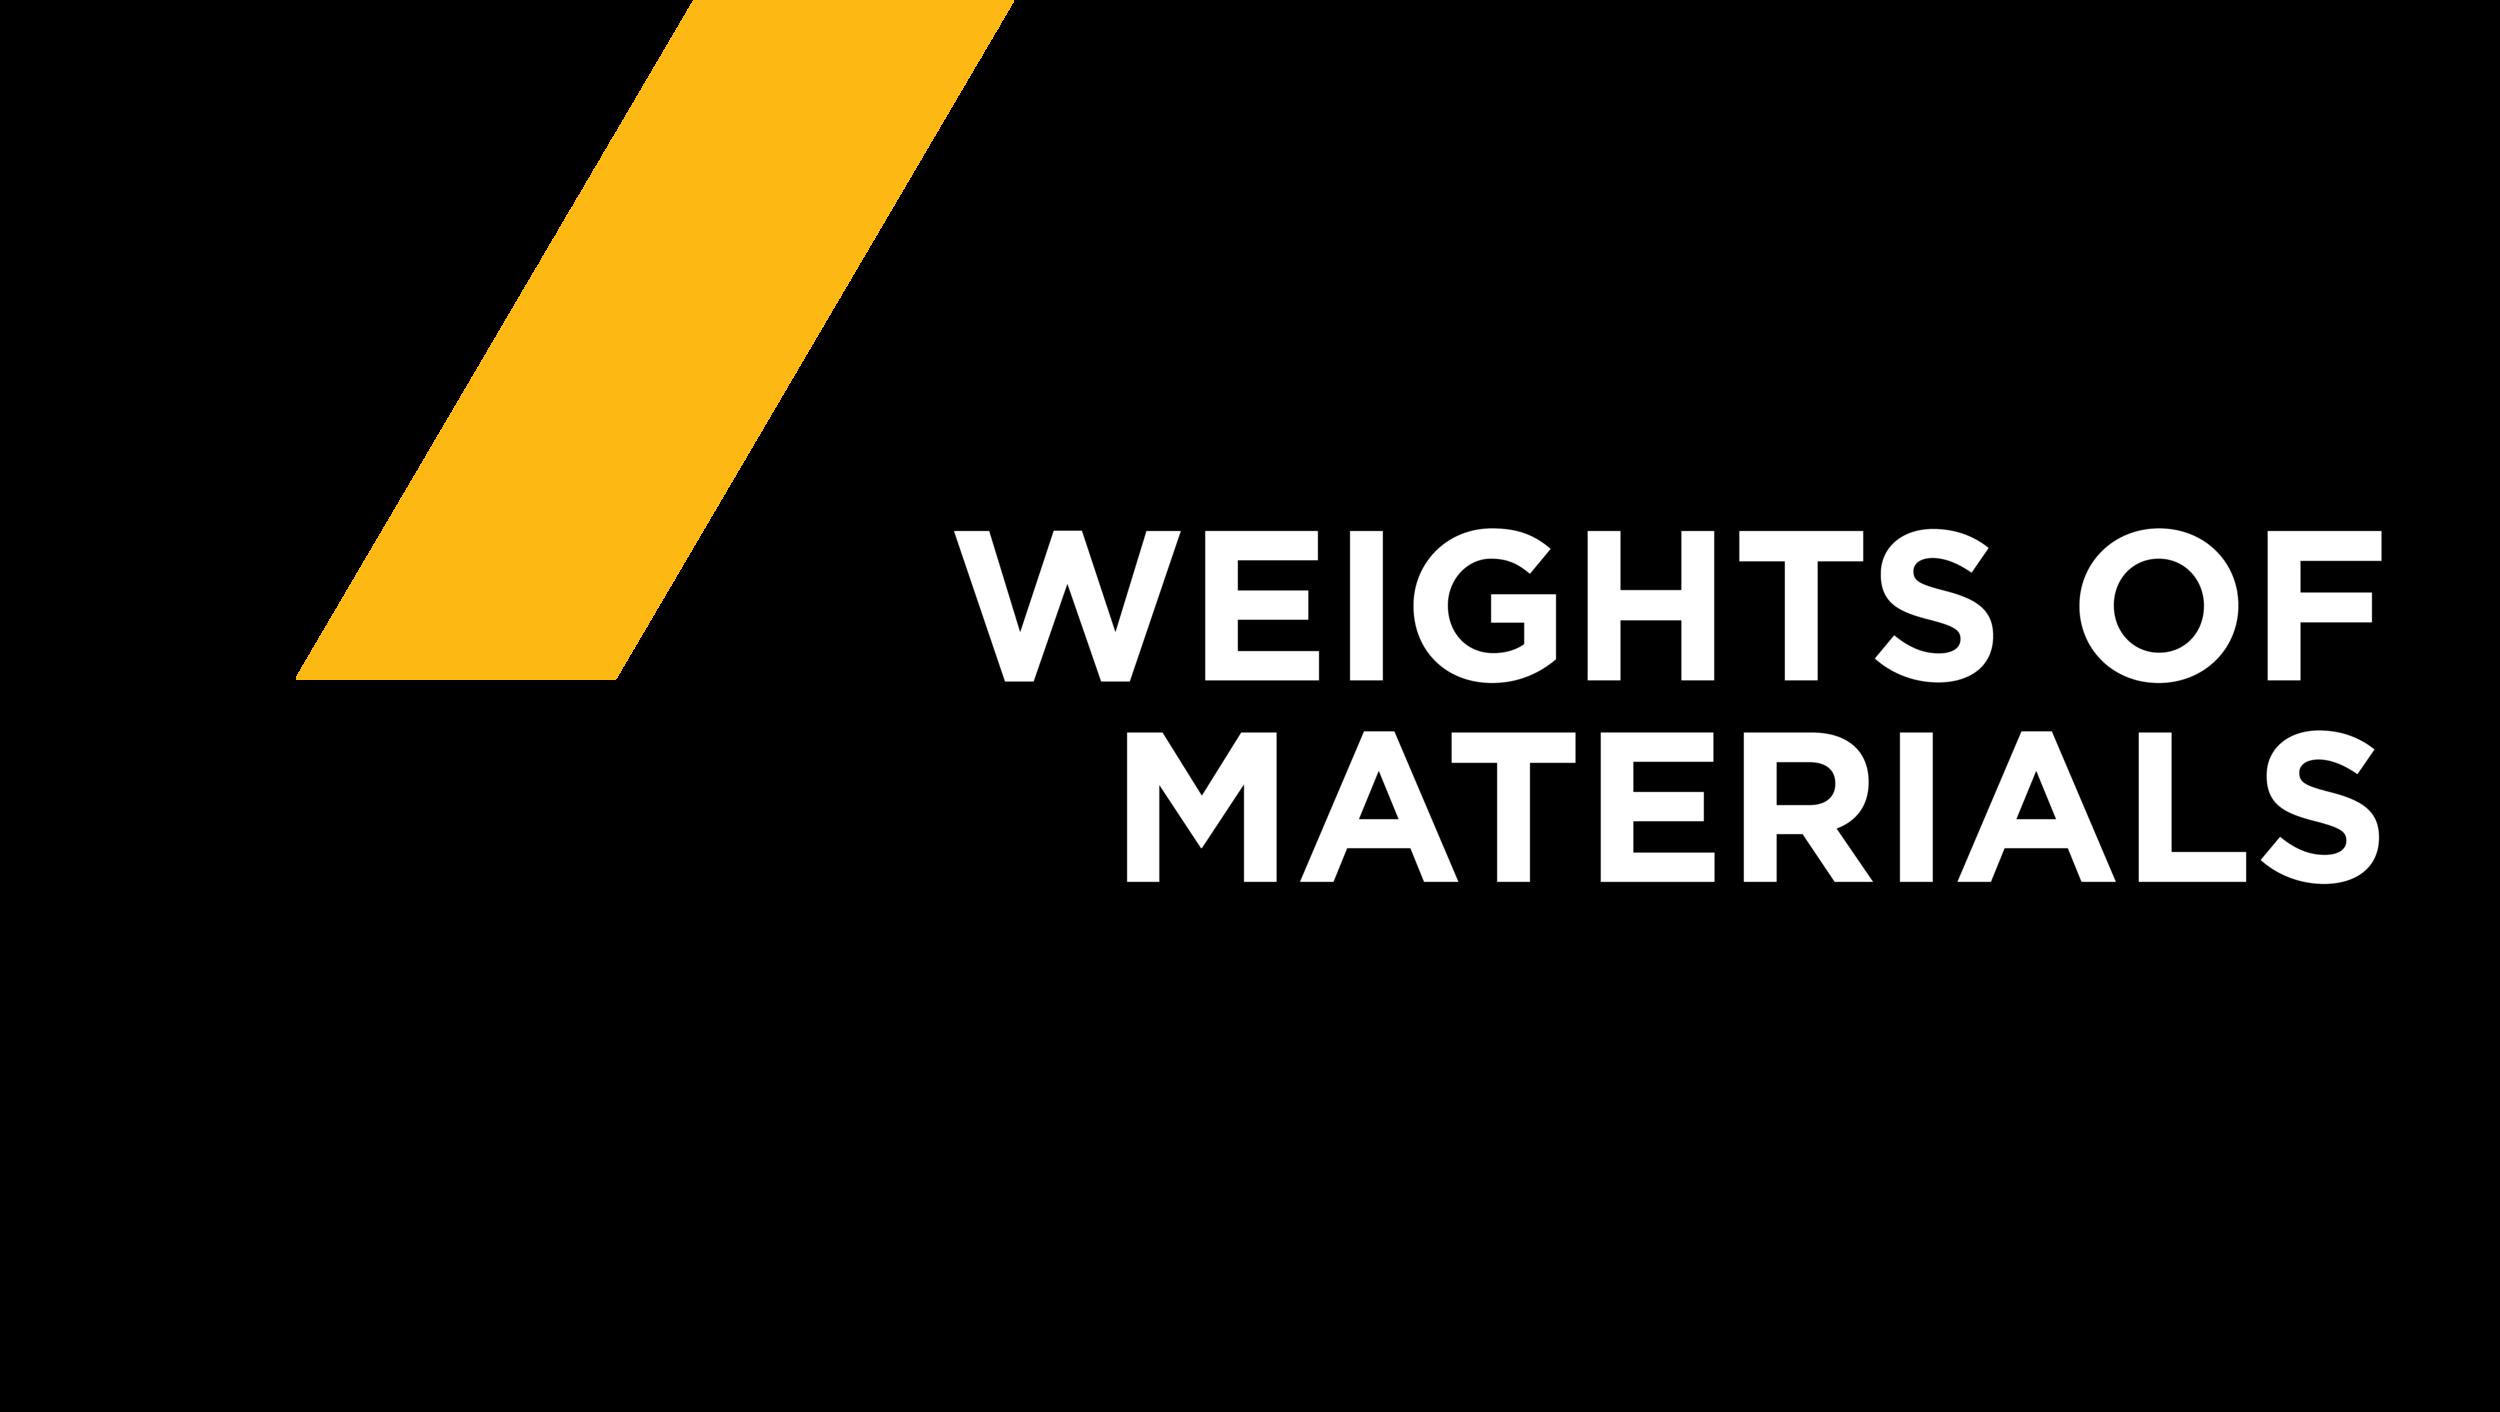 HESCO-weights-of-mateirals-button-01.png